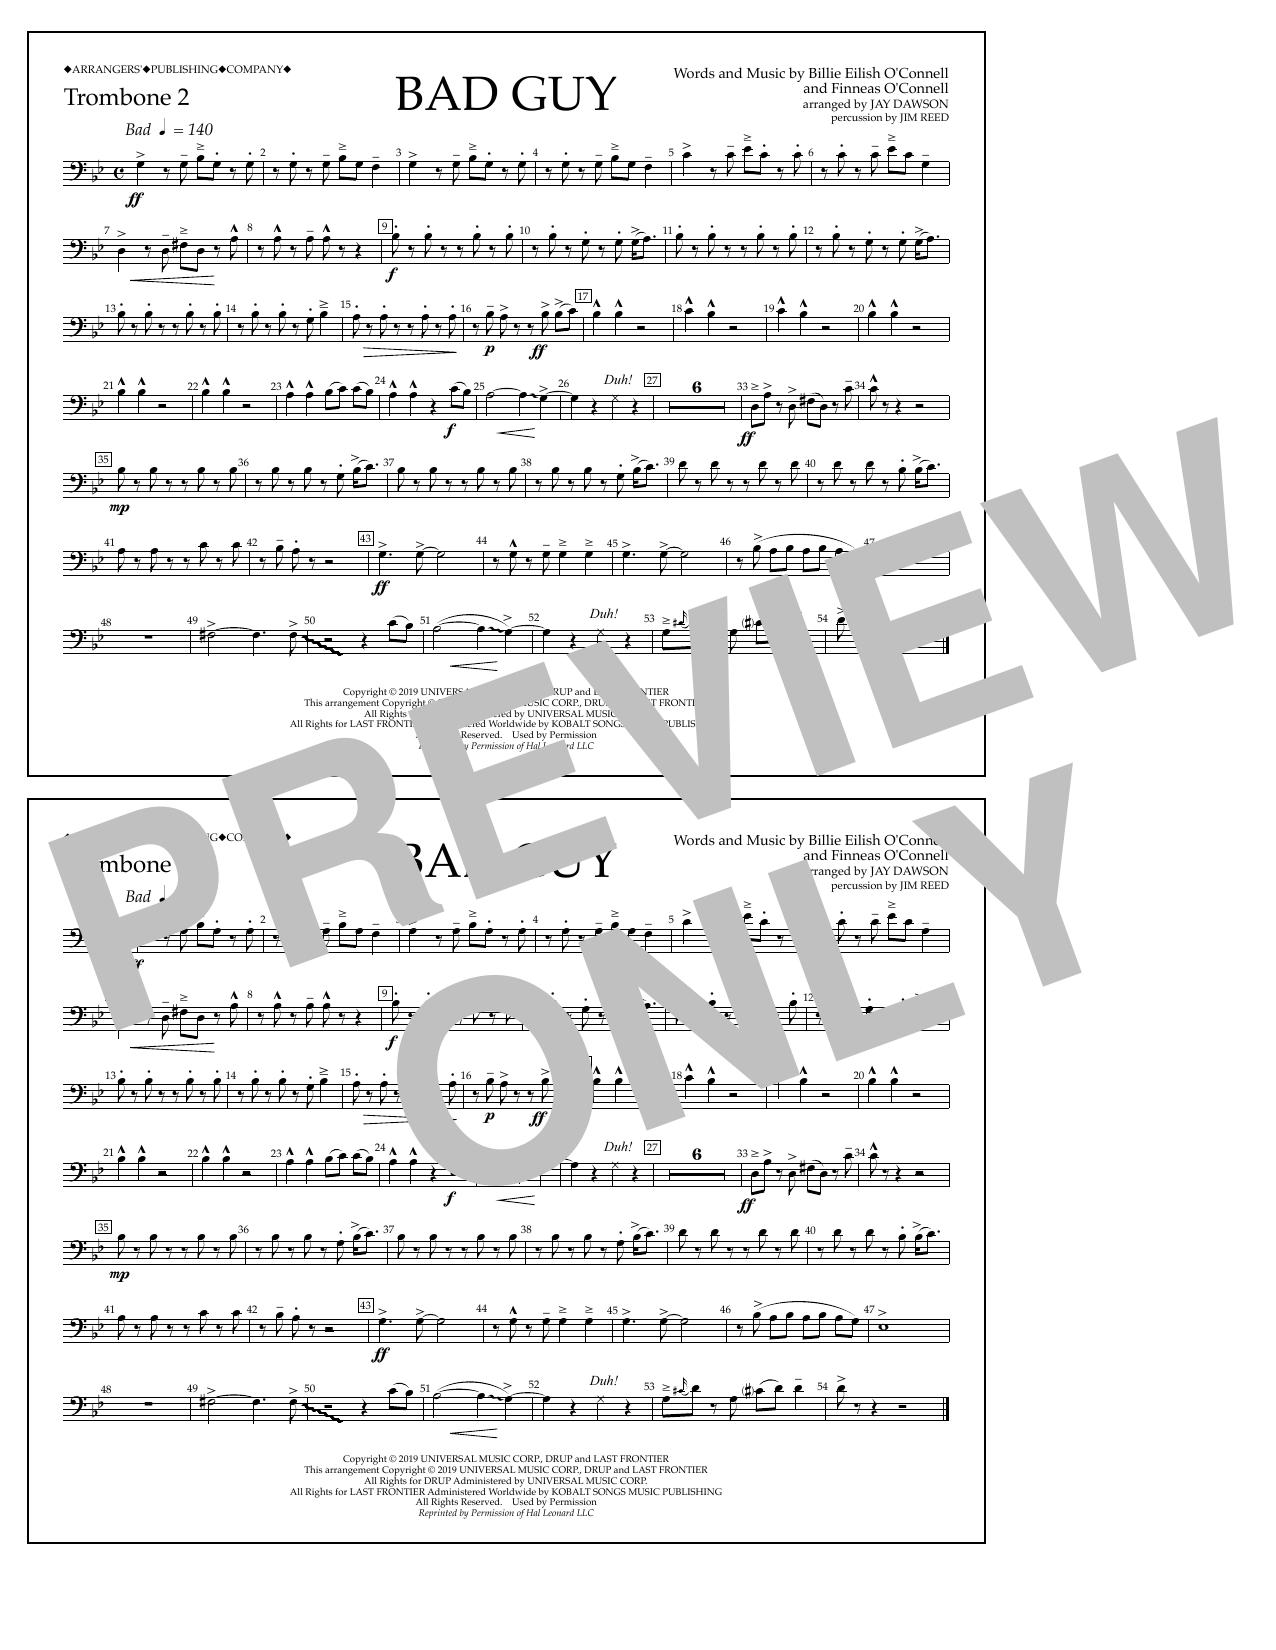 Bad Guy (arr. Jay Dawson) - Trombone 2 (Marching Band)